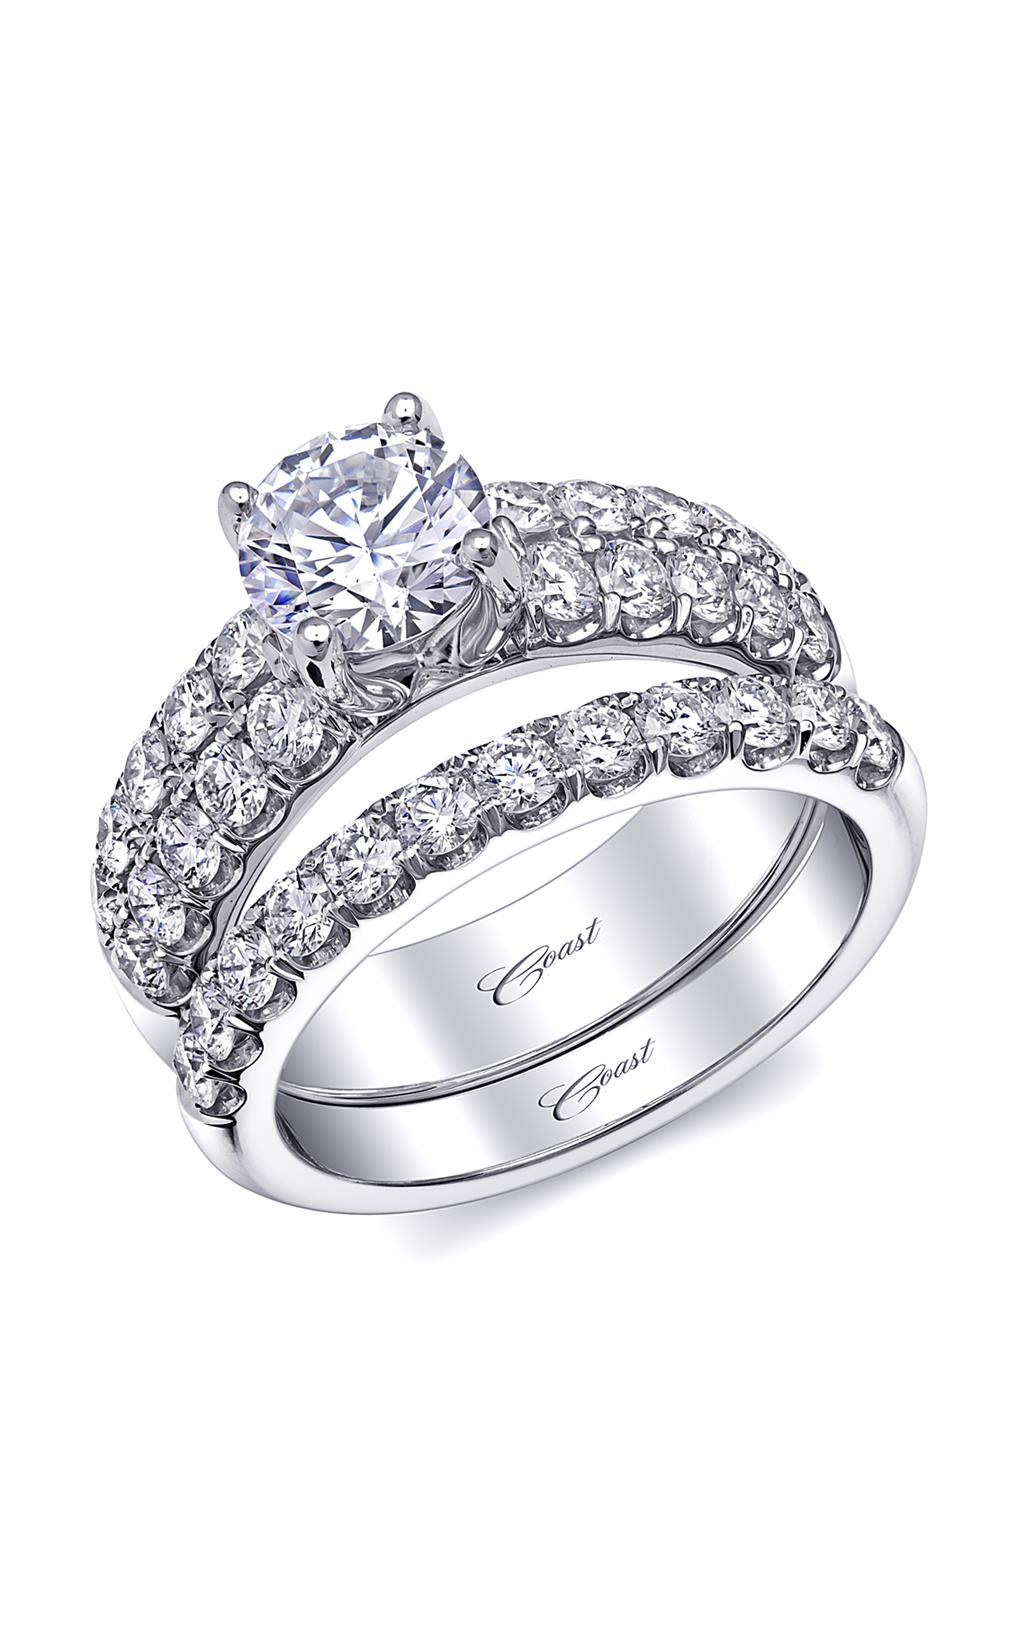 Coast Diamond Charisma LJ6025 WJ6025 product image